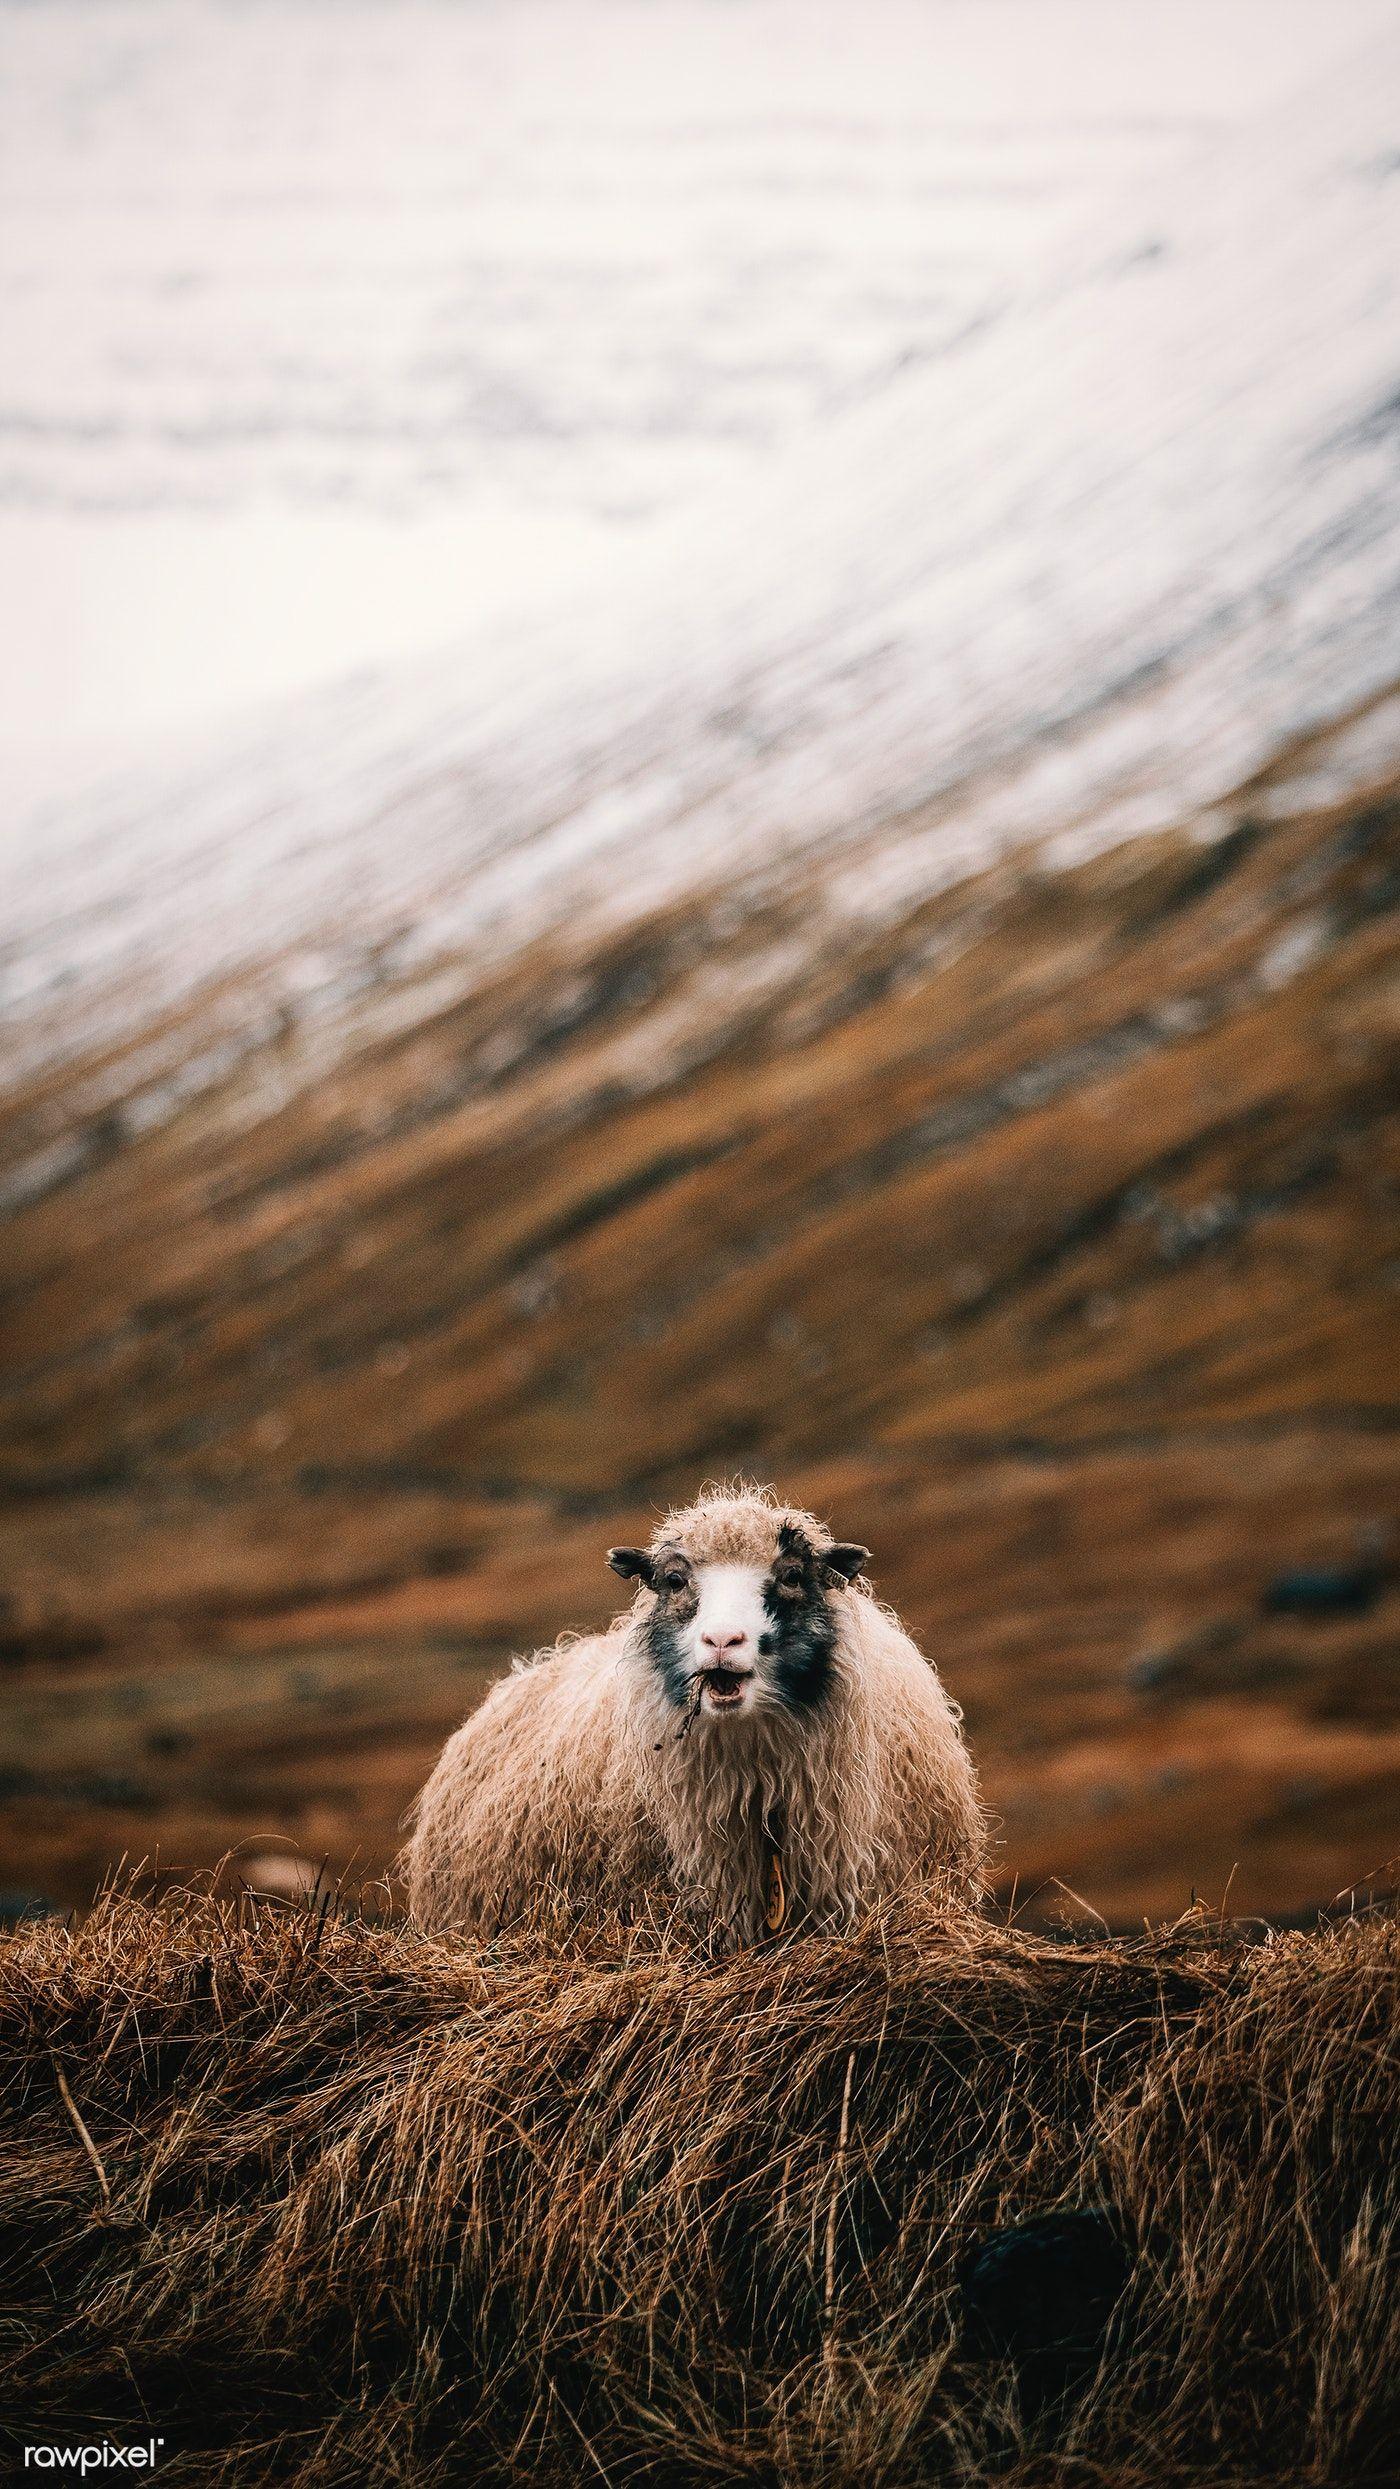 Download premium image of Faroe sheep in the field 2208538